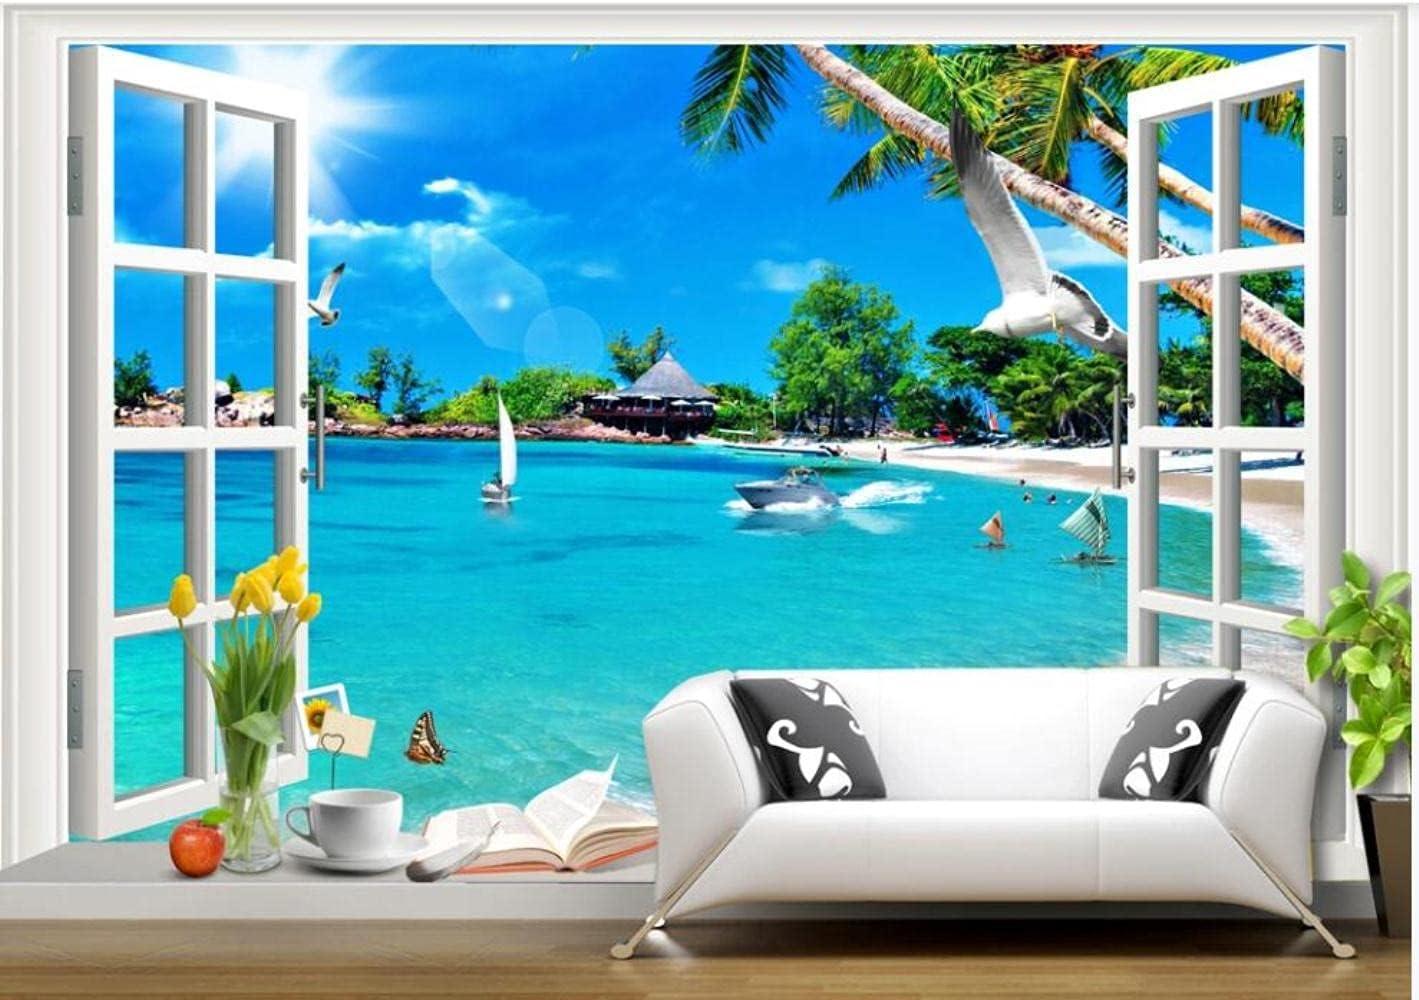 MAZF Custom Mural on The Wall Paper Window Sky sea 3D Classic Blue Overseas parallel import regular item Beach